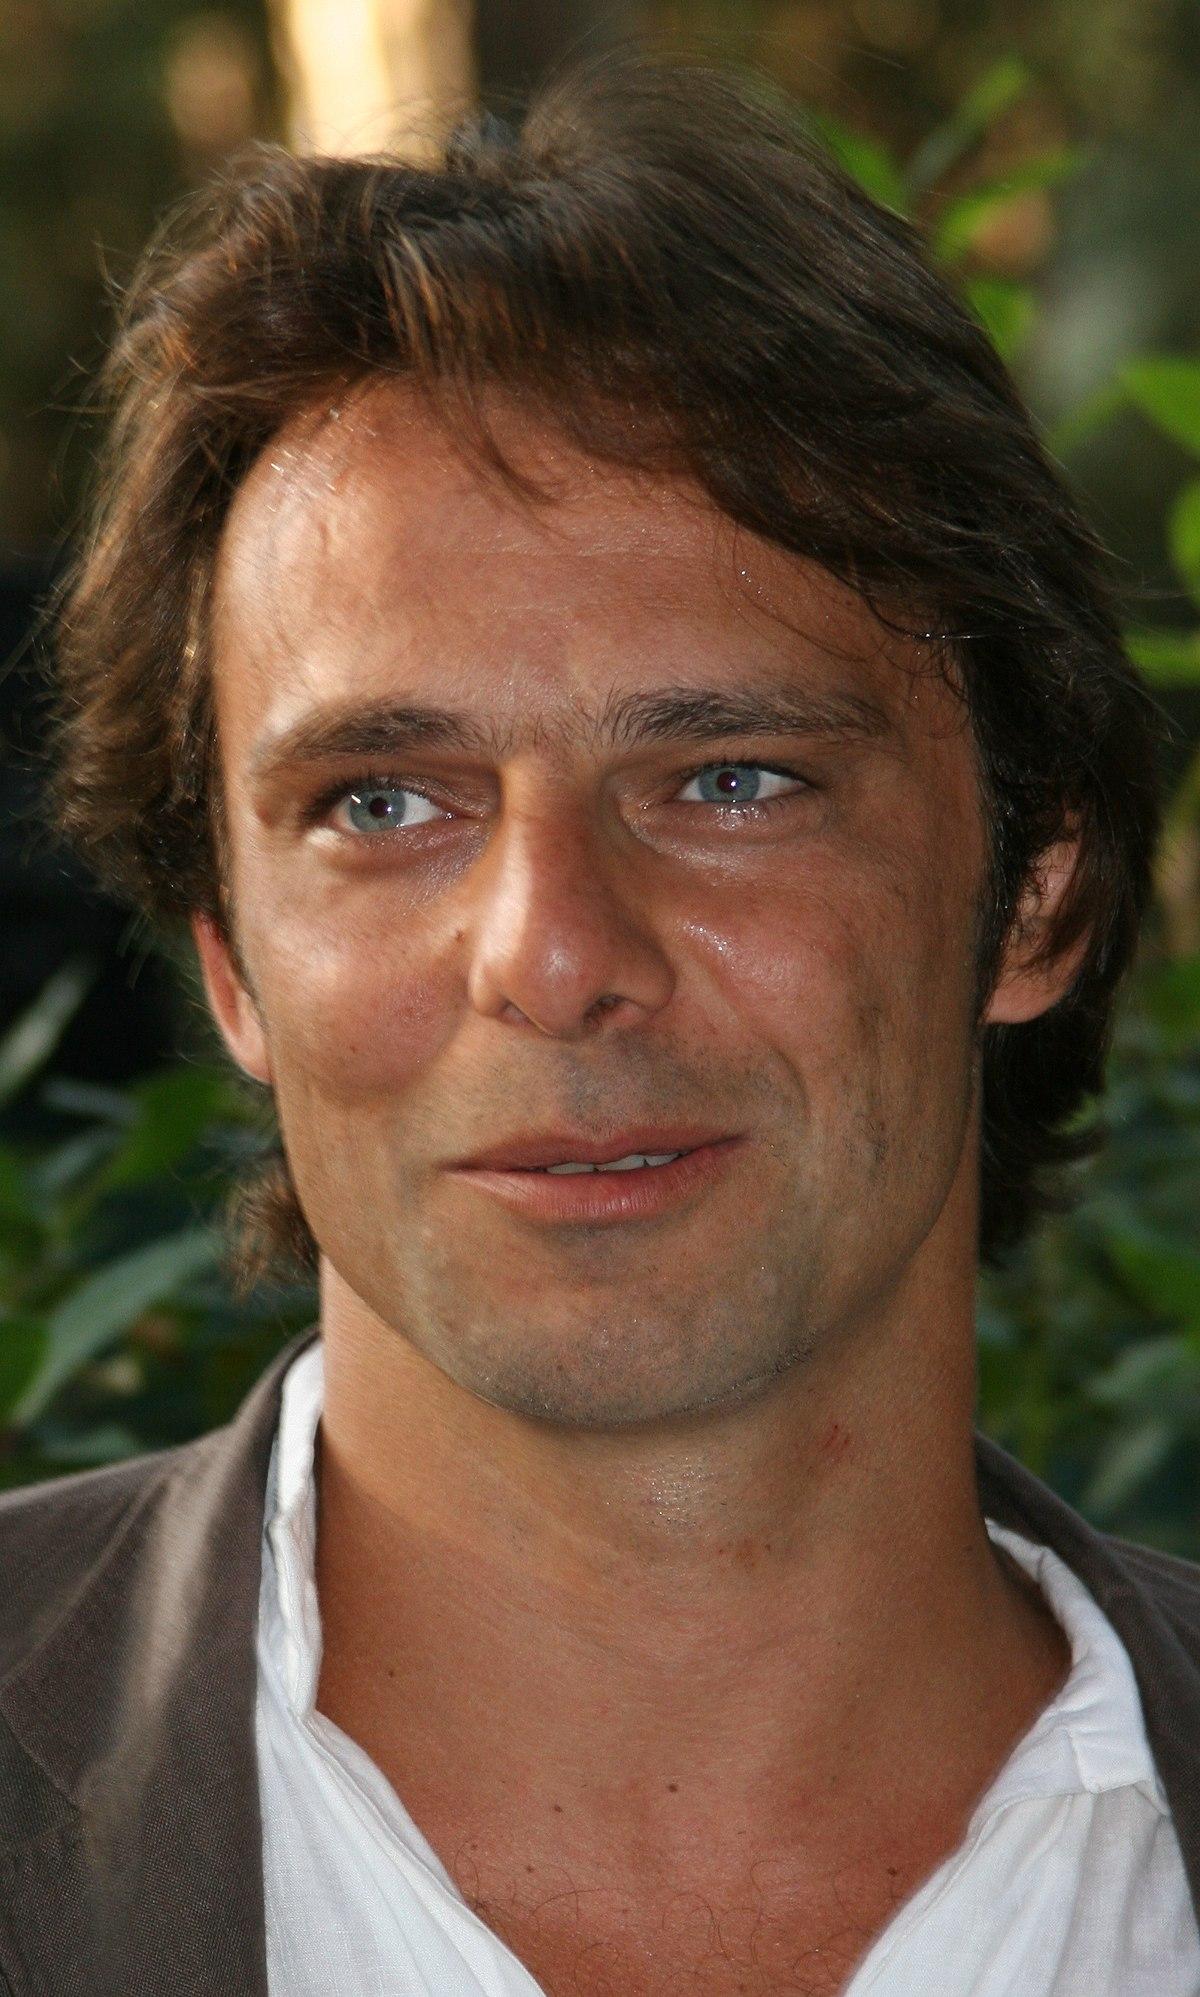 Alessandro preziosi wikipedia for Youtube oggi